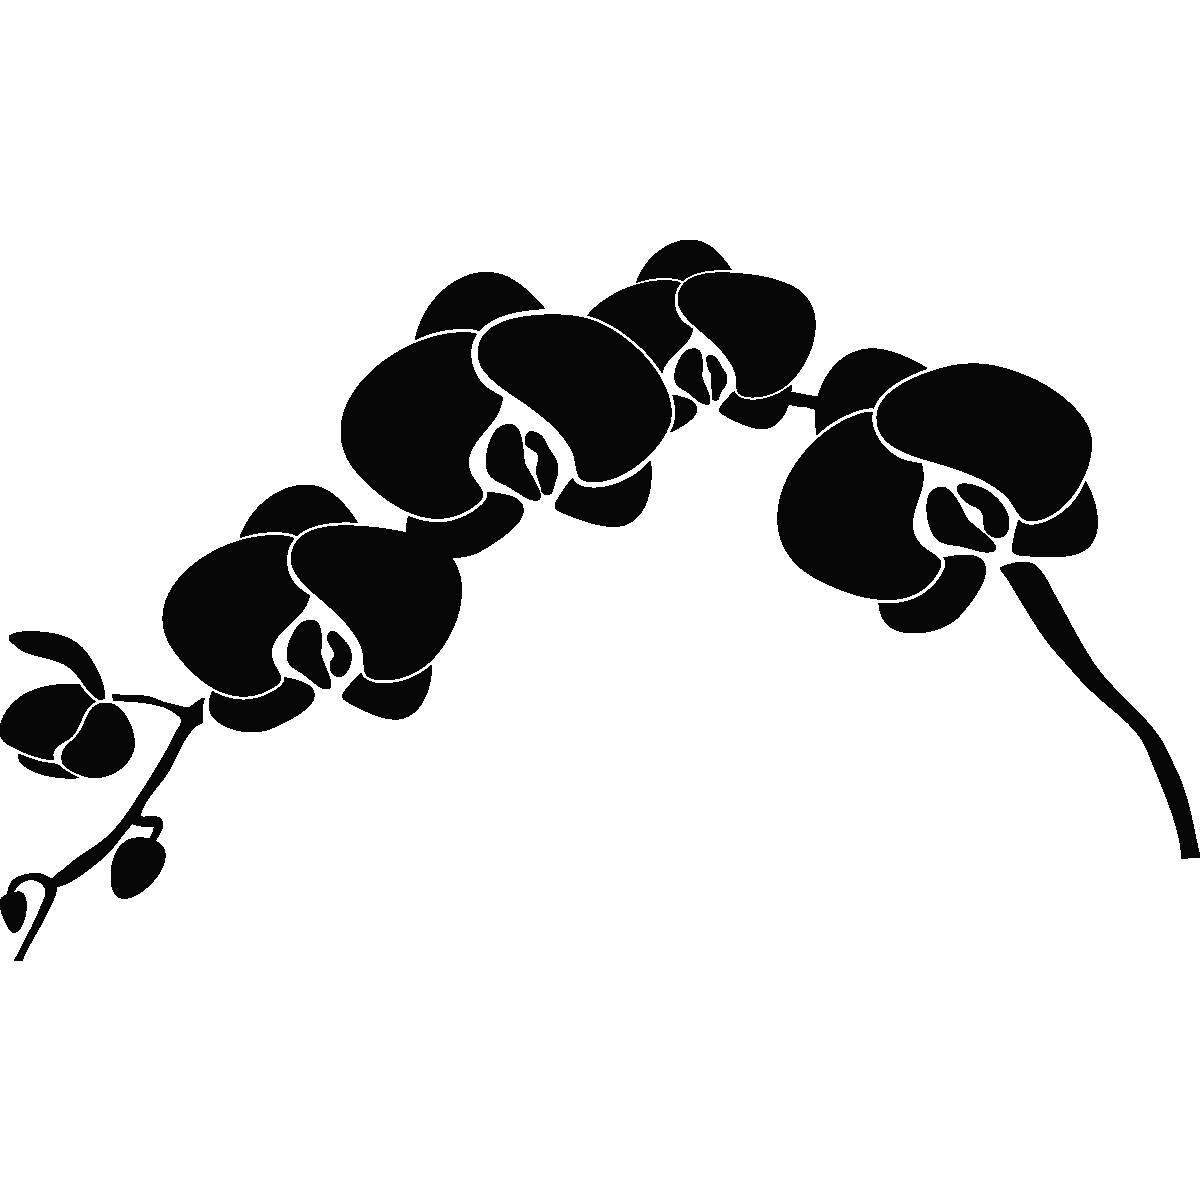 stickers muraux pour salle de bain sticker mural orchid e ambiance. Black Bedroom Furniture Sets. Home Design Ideas